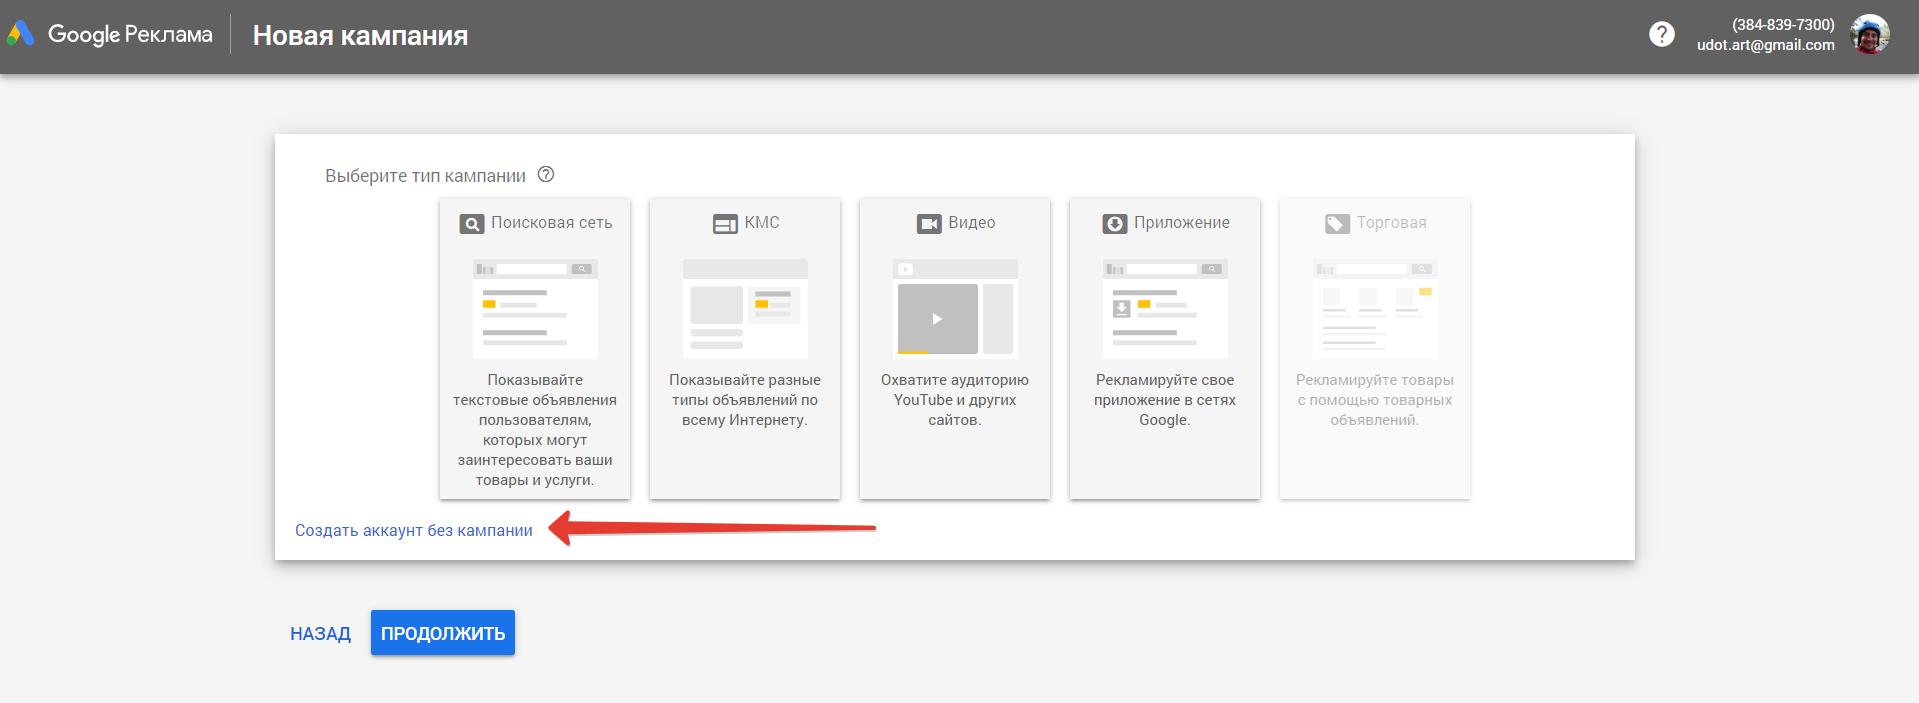 Google Keyword Planner тип кампании